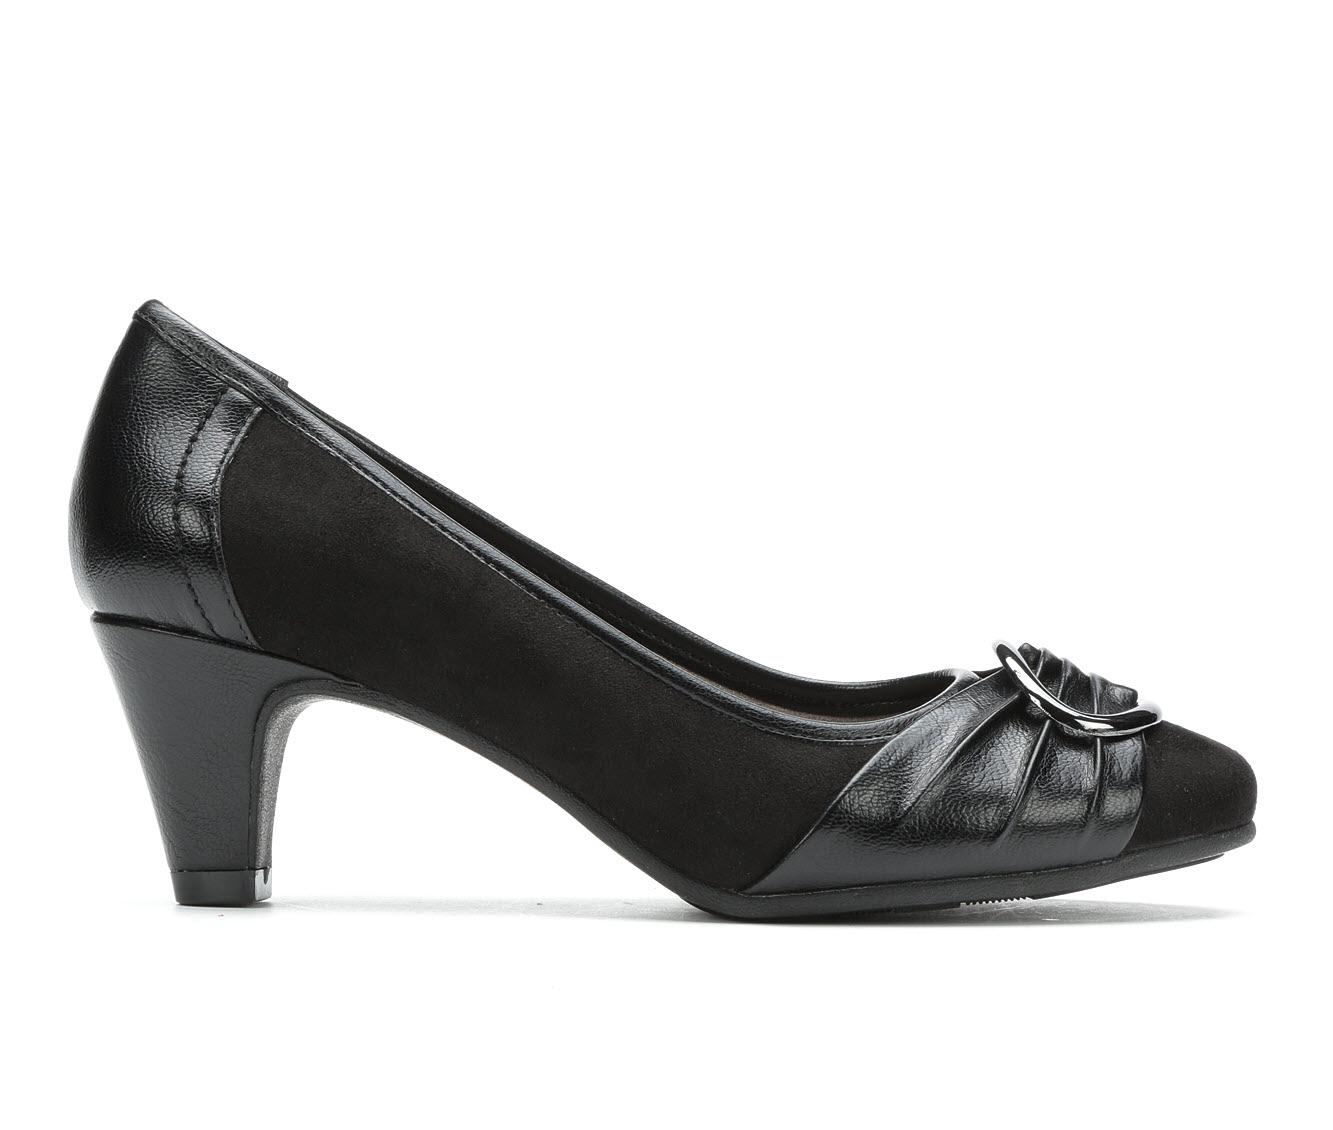 Andiamo Belle Women's Dress Shoe (Black Faux Leather)